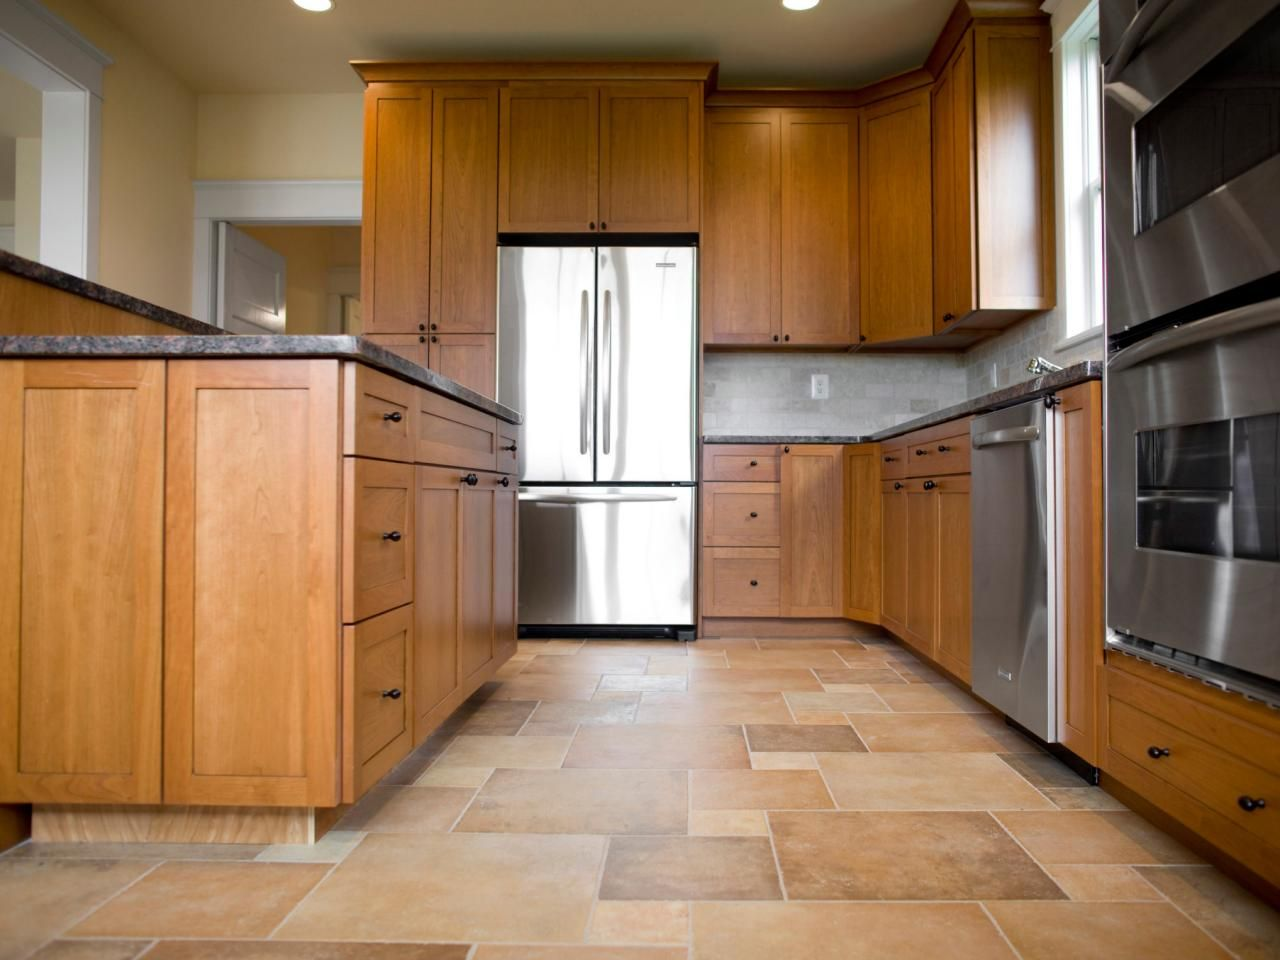 Brainy Tile Ideas For Kitchen , Lovely Tile Ideas For Kitchen 9 ...